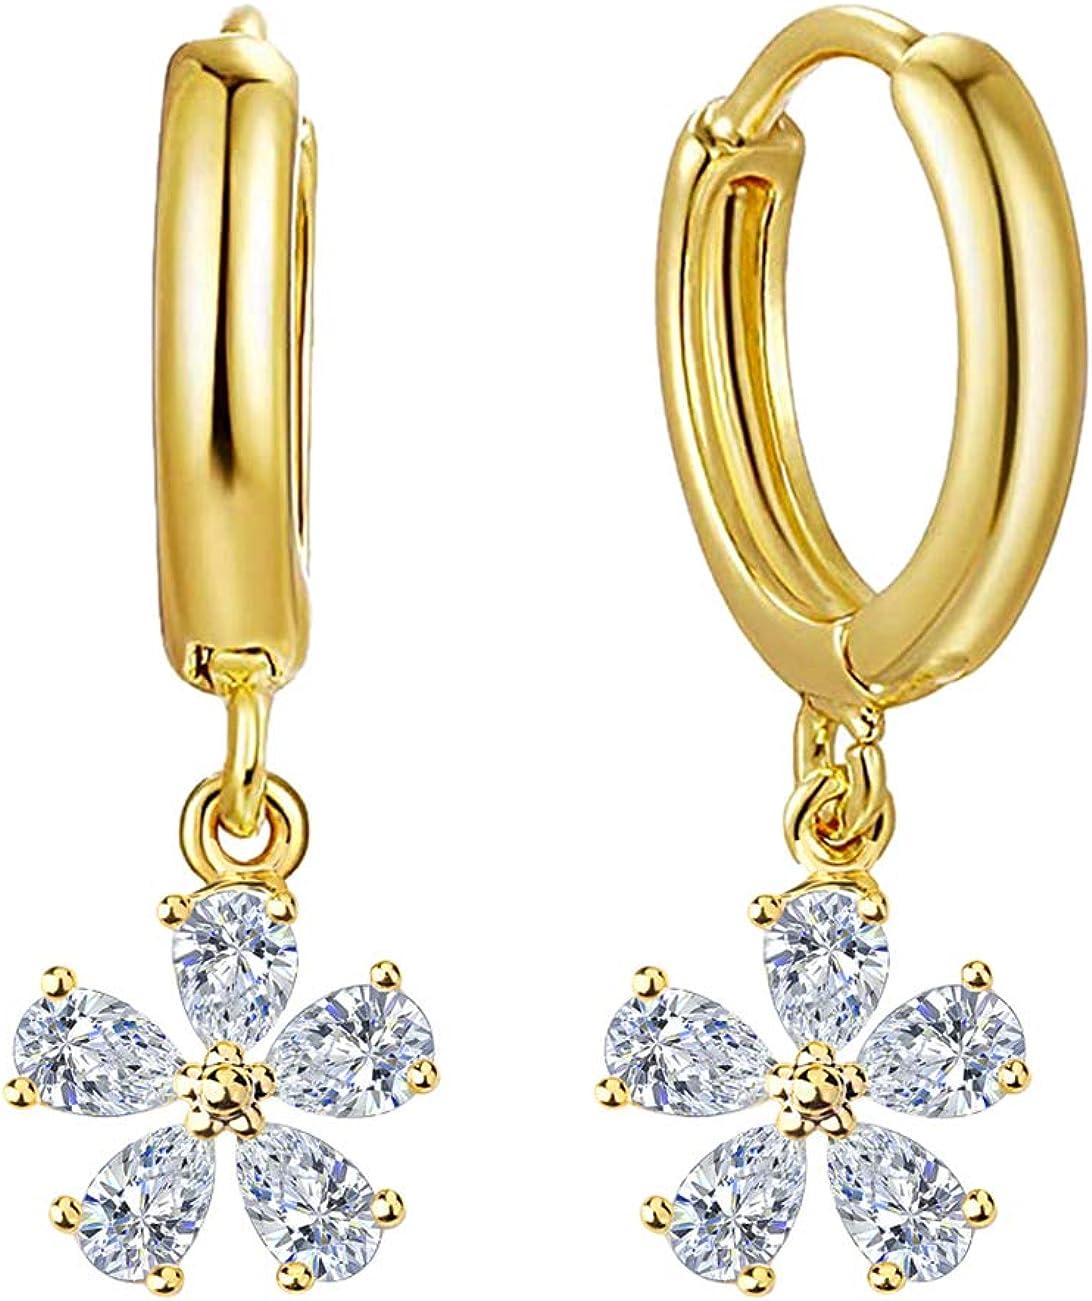 Tulsa Mall AnnBabic Tiny Dangle Huggie Earrings for Women Moon safety Star Cross -